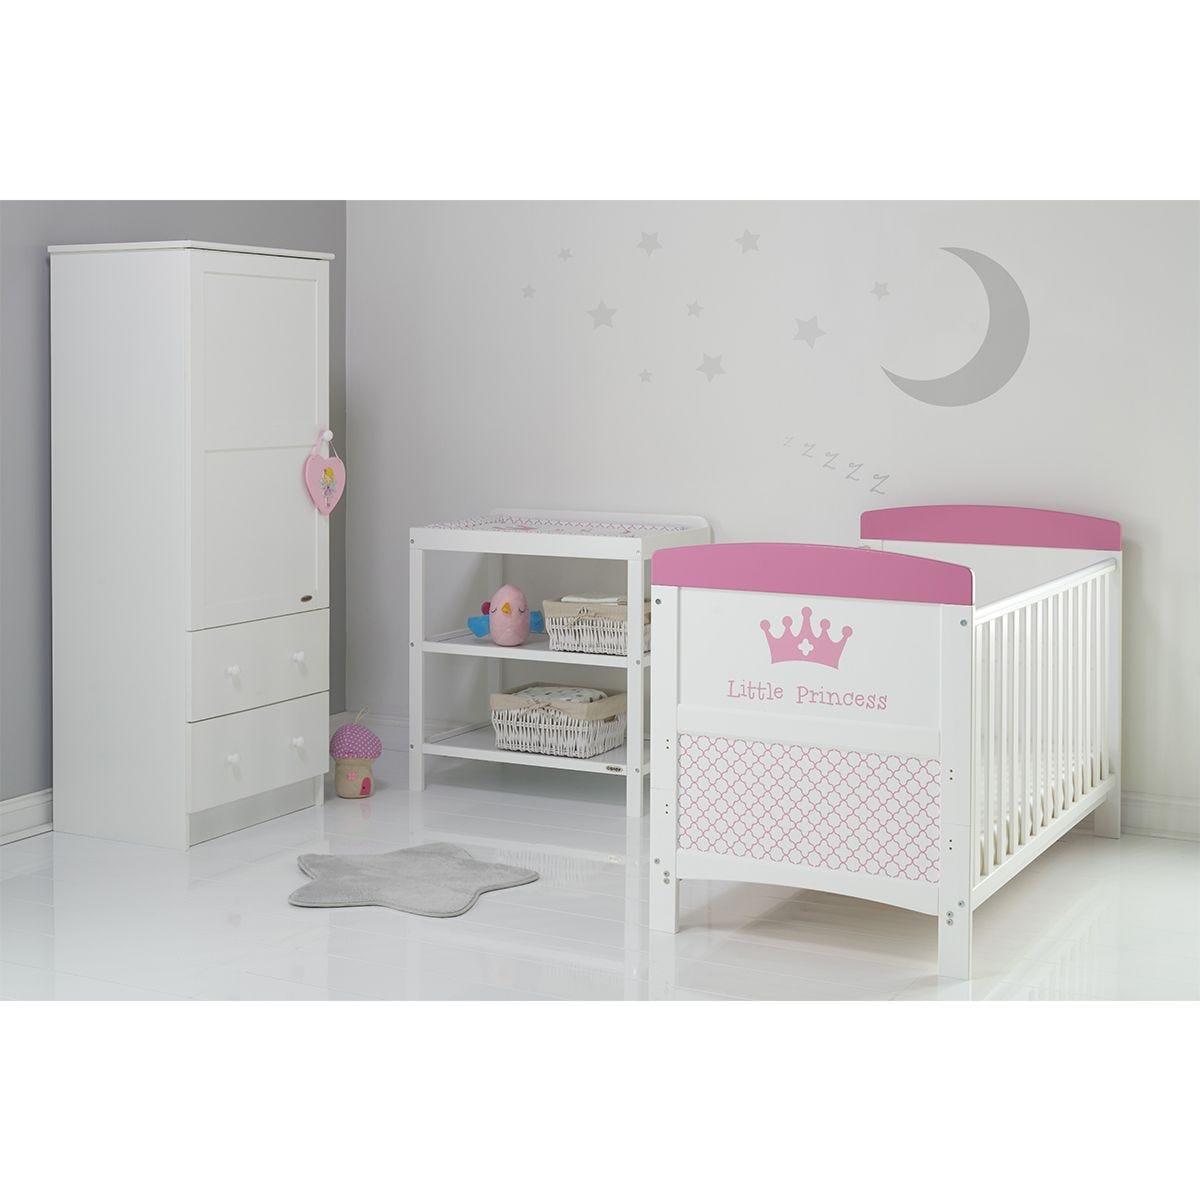 Obaby Grace Inspire 3 Piece Room Set & Changing Mat - Little Princess